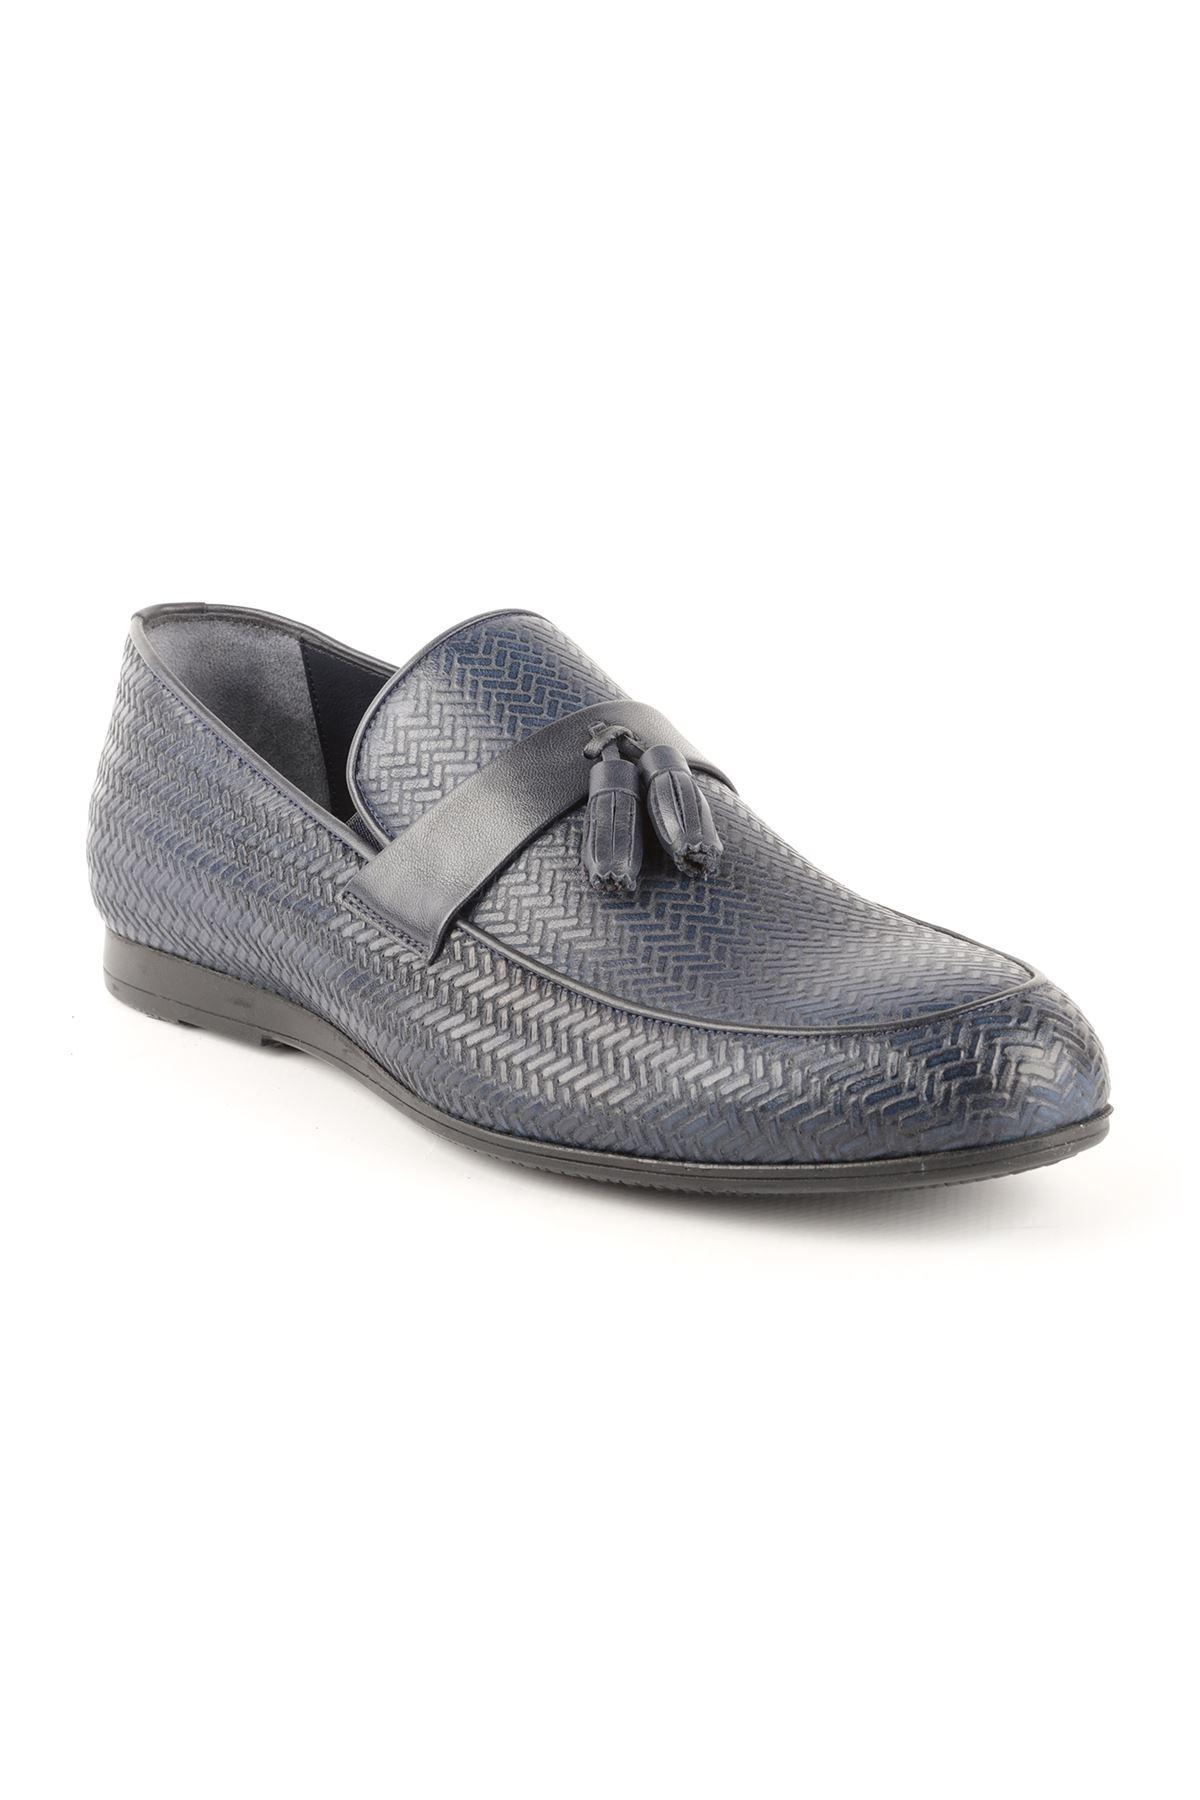 Libero T1422 Navy Blue Oxford Shoes